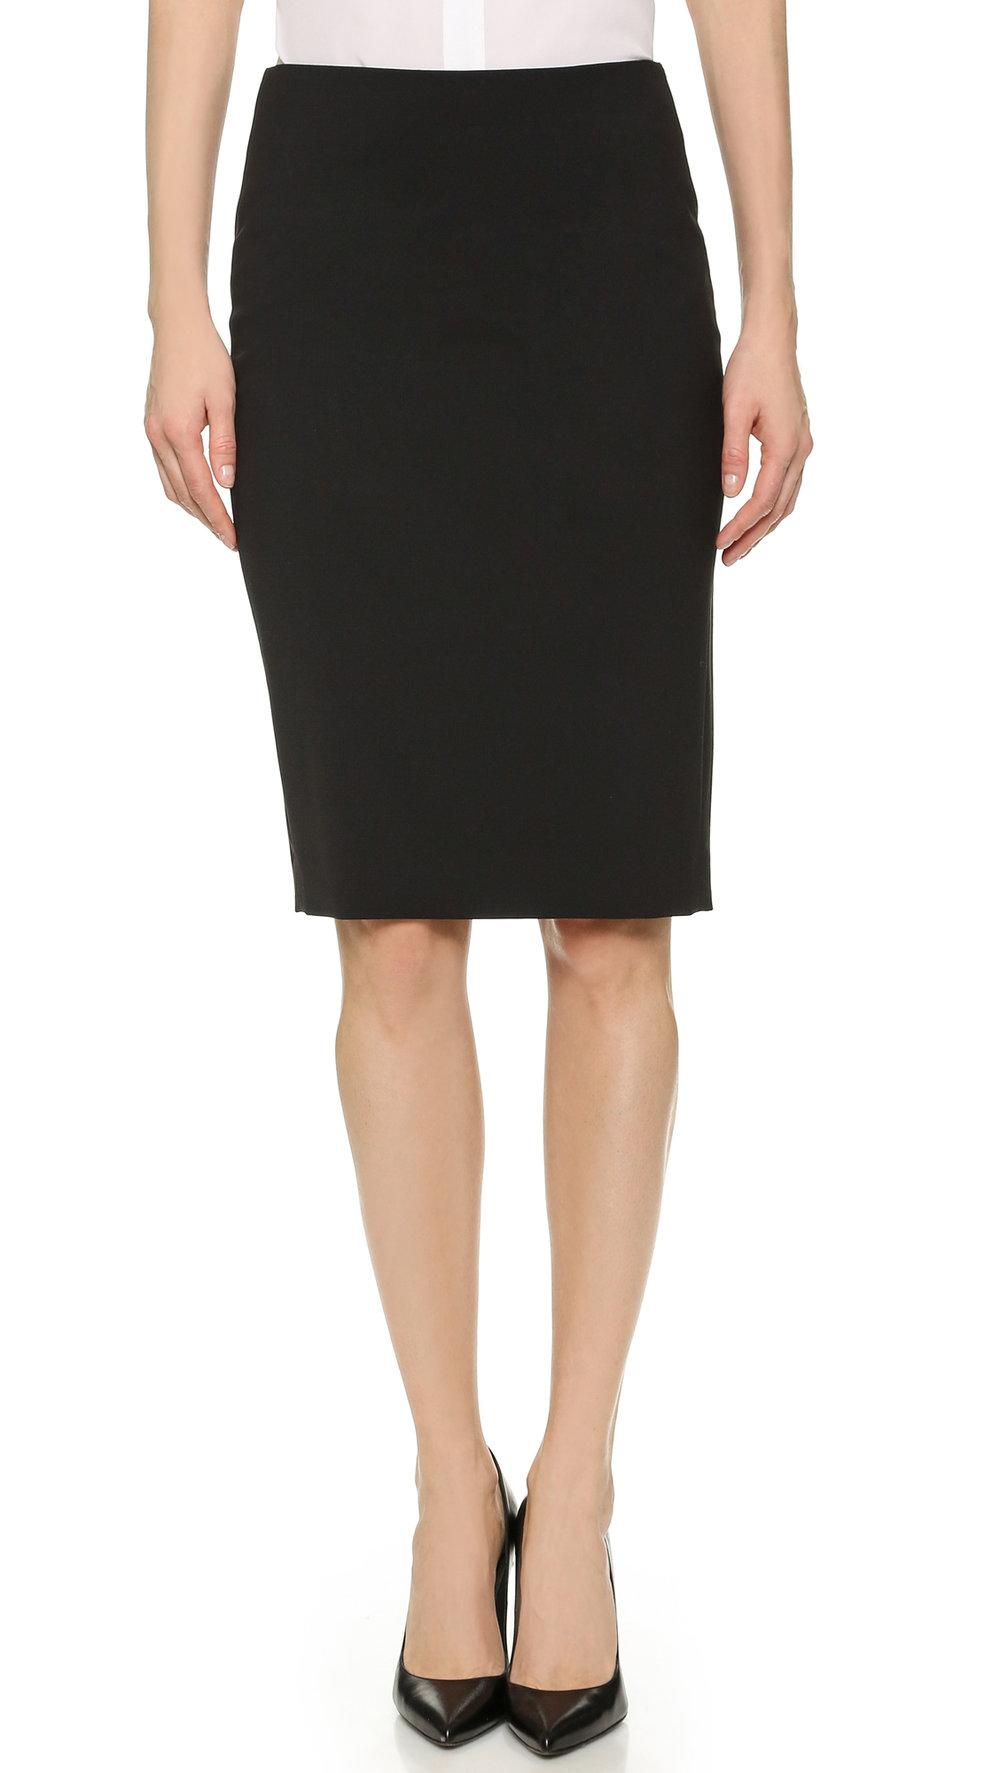 Theory Pencil Skirt $215